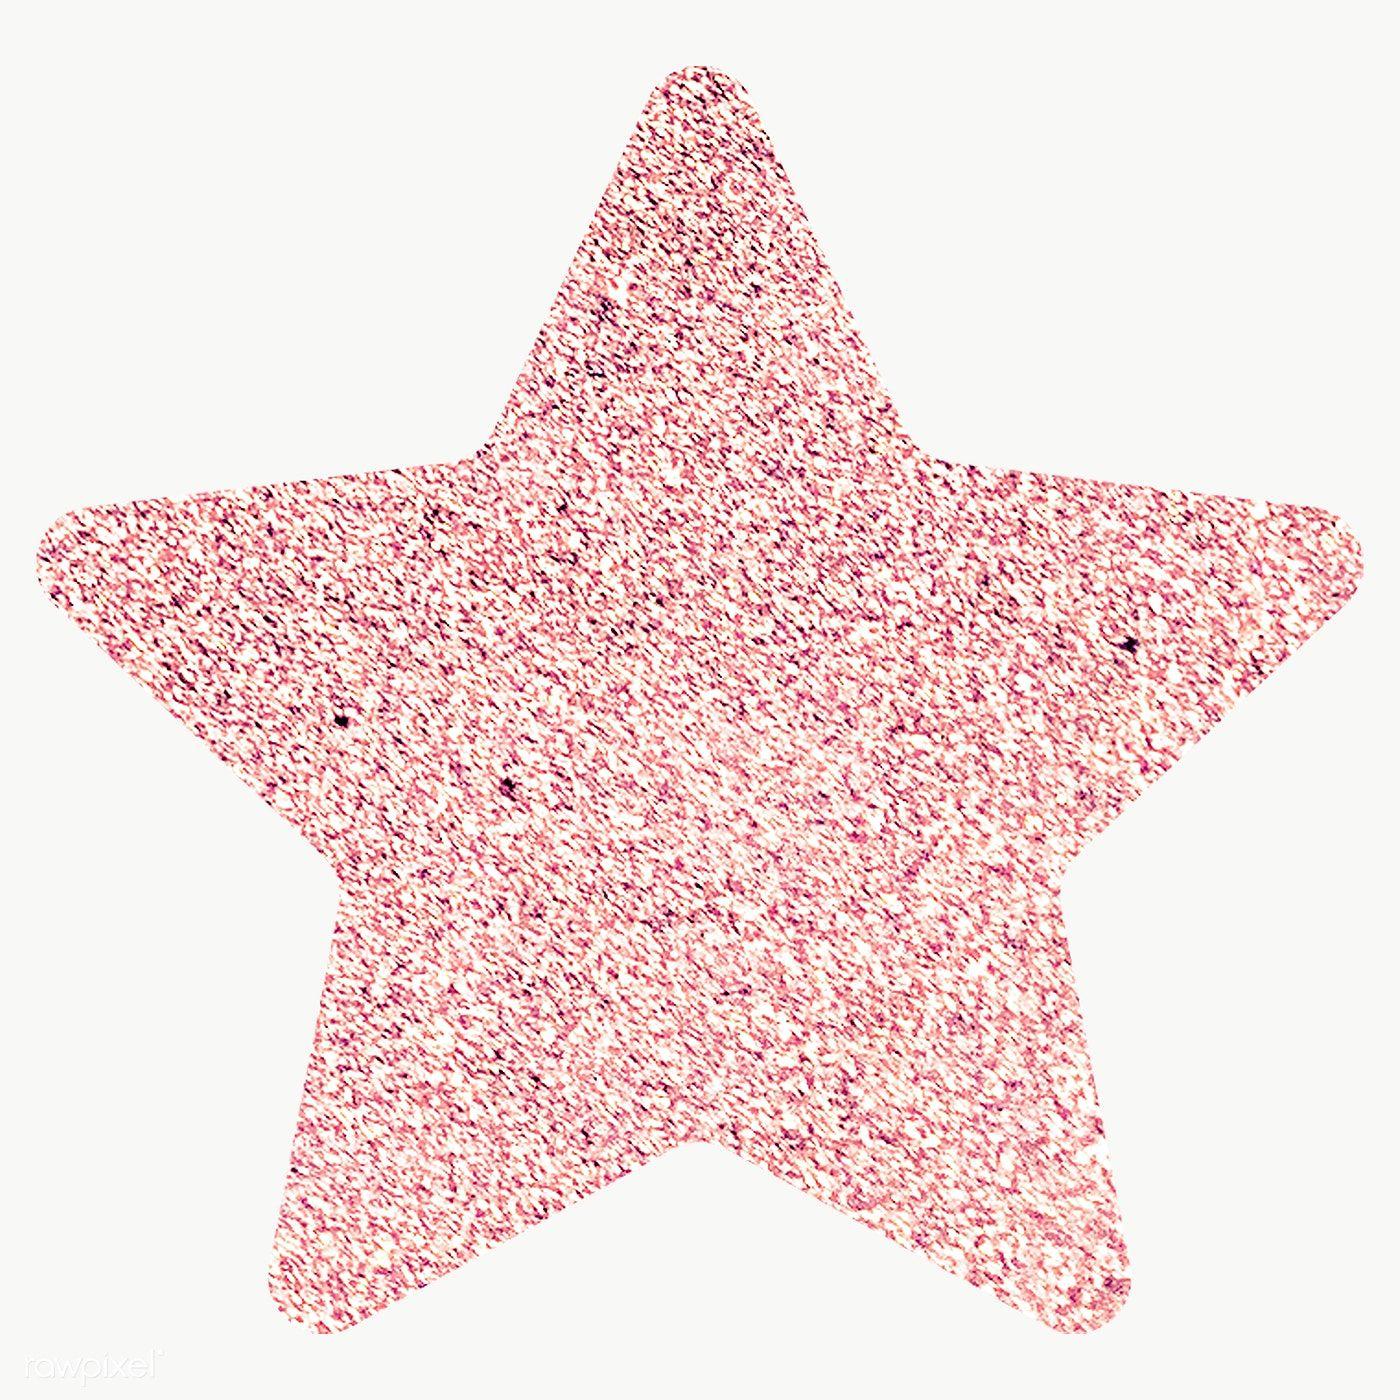 Glitter Star Sticker Transparent Png Free Image By Rawpixel Com Ningzk V